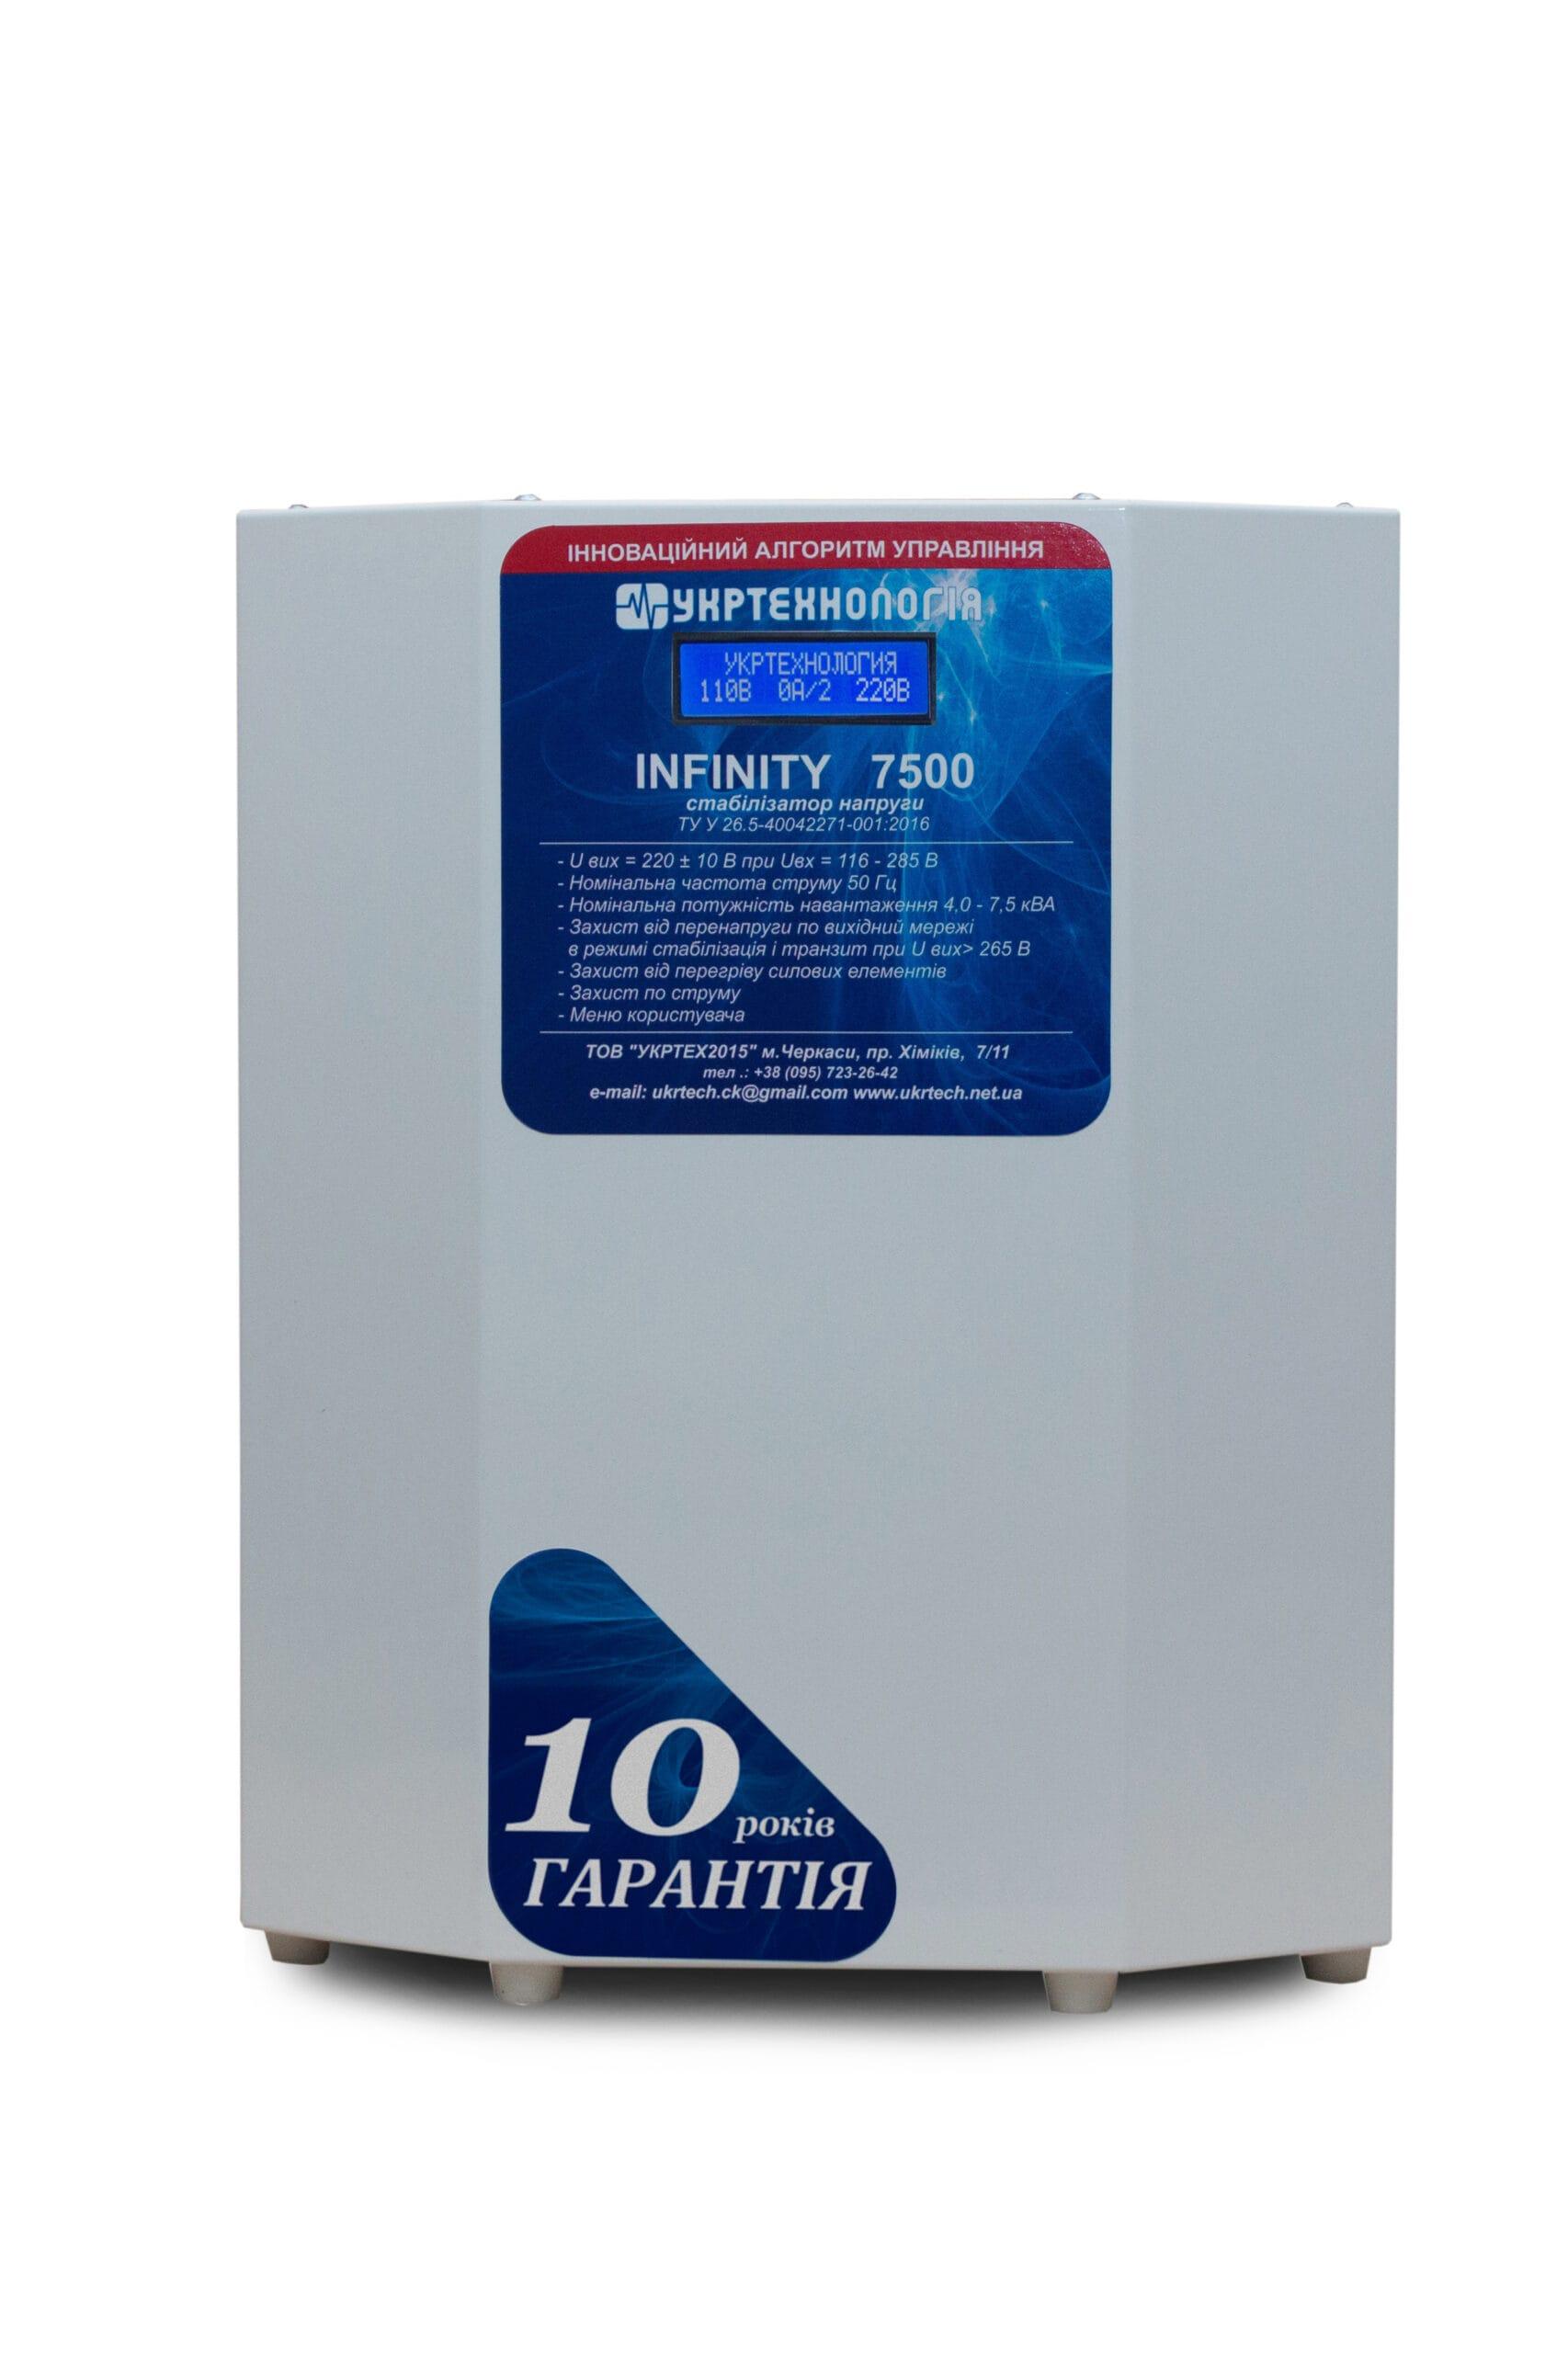 Стабилизаторы напряжения - Стабилизатор напряжения 7,5 кВт INFINITY 000001411 - Фото 3